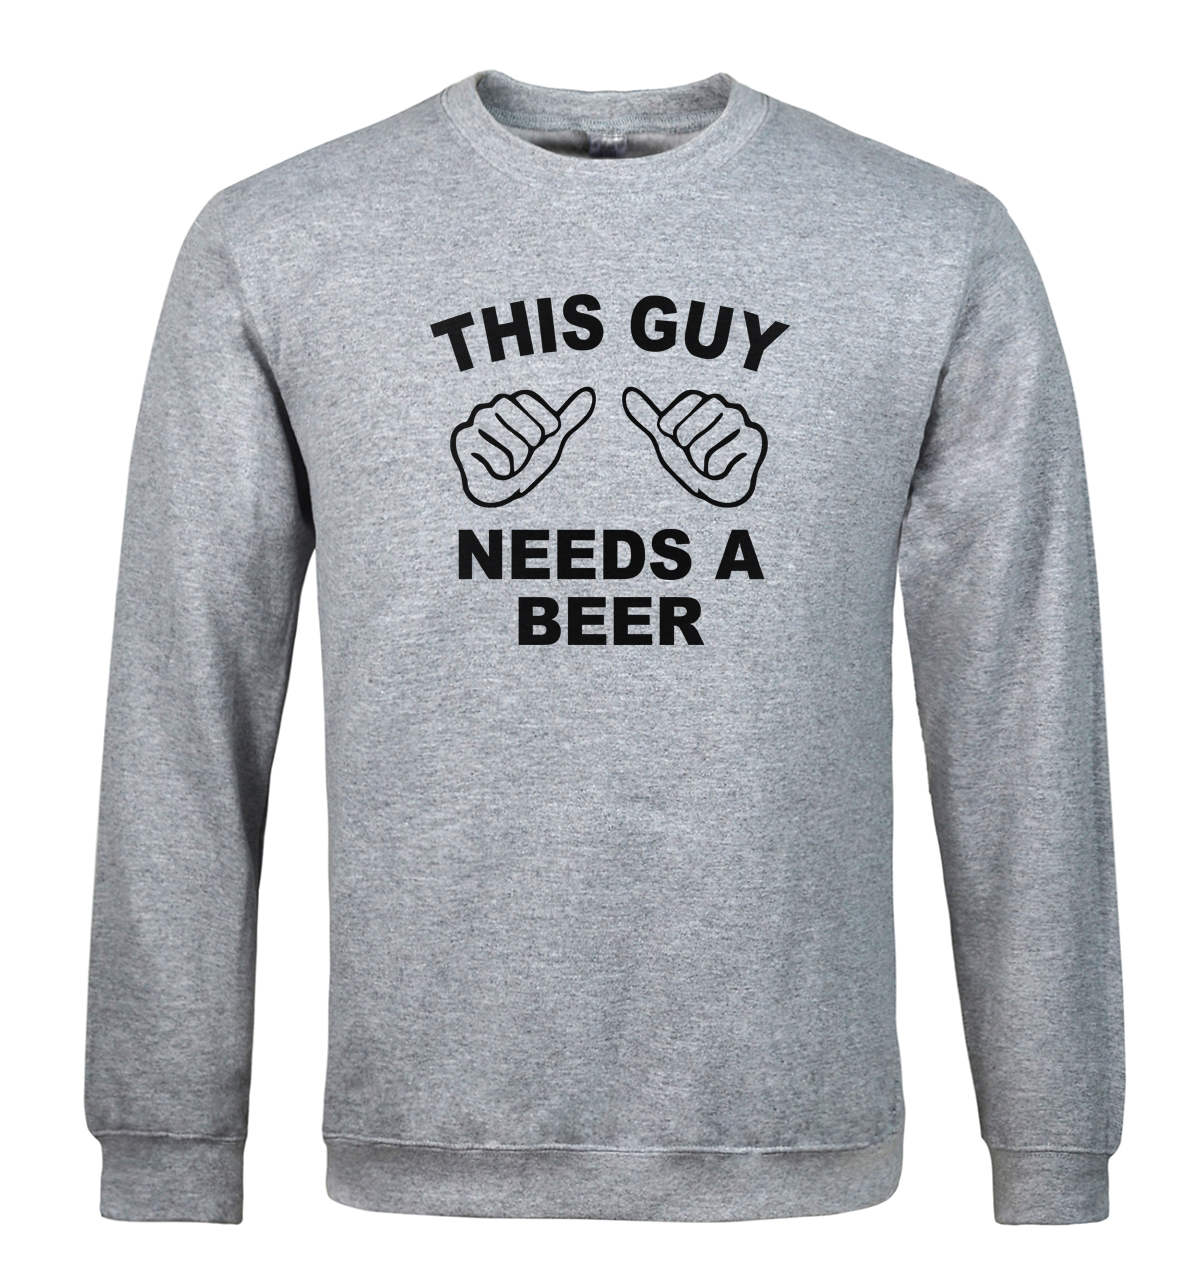 New arrival sweatshirt for men 2019 hoody letter print THIS GUY NEEDS A BEER funny hoodies men's sportswear tracksuits hoodie